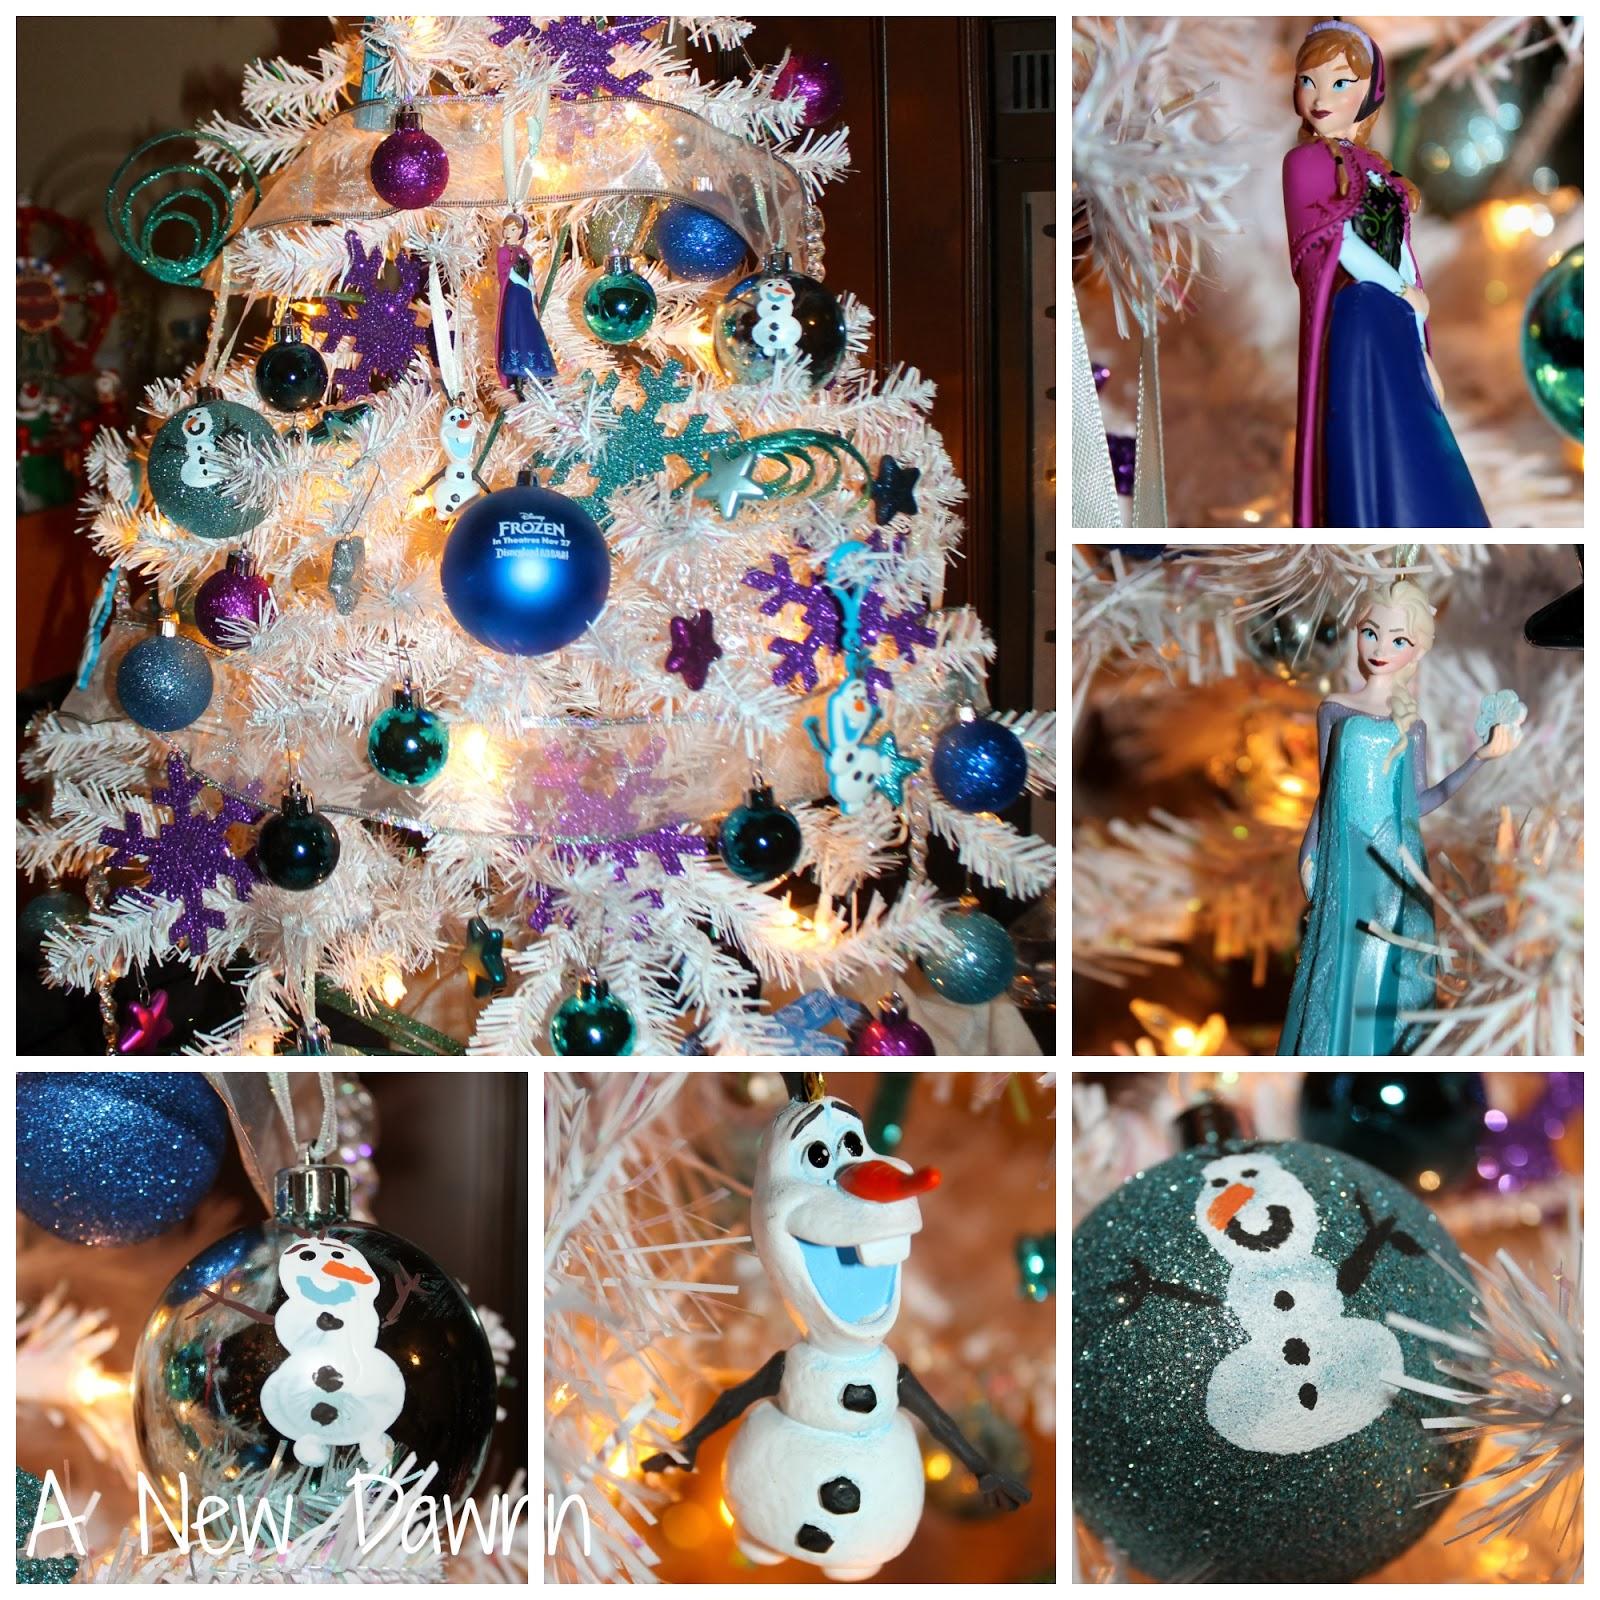 Christmas Tree Ideas For Frozen : A new dawnn disney frozen christmas tree make your own